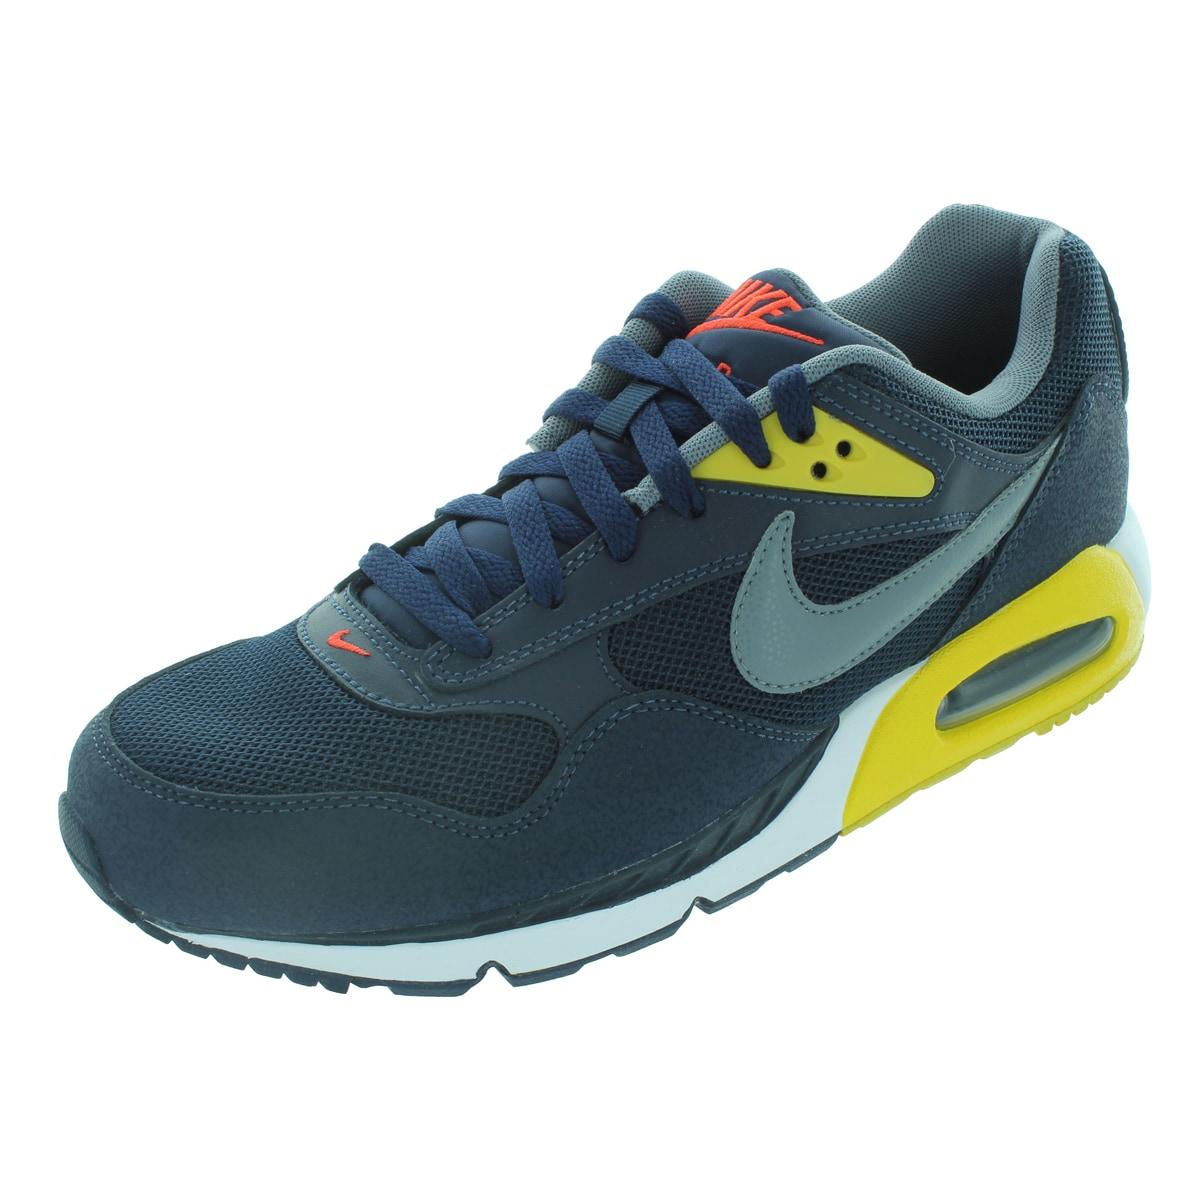 esférico Con Júnior  Nike Air Max Correlate Running Shoes Obsdn/Grey/Sprt /Tm Orange - Overstock  - 12118865